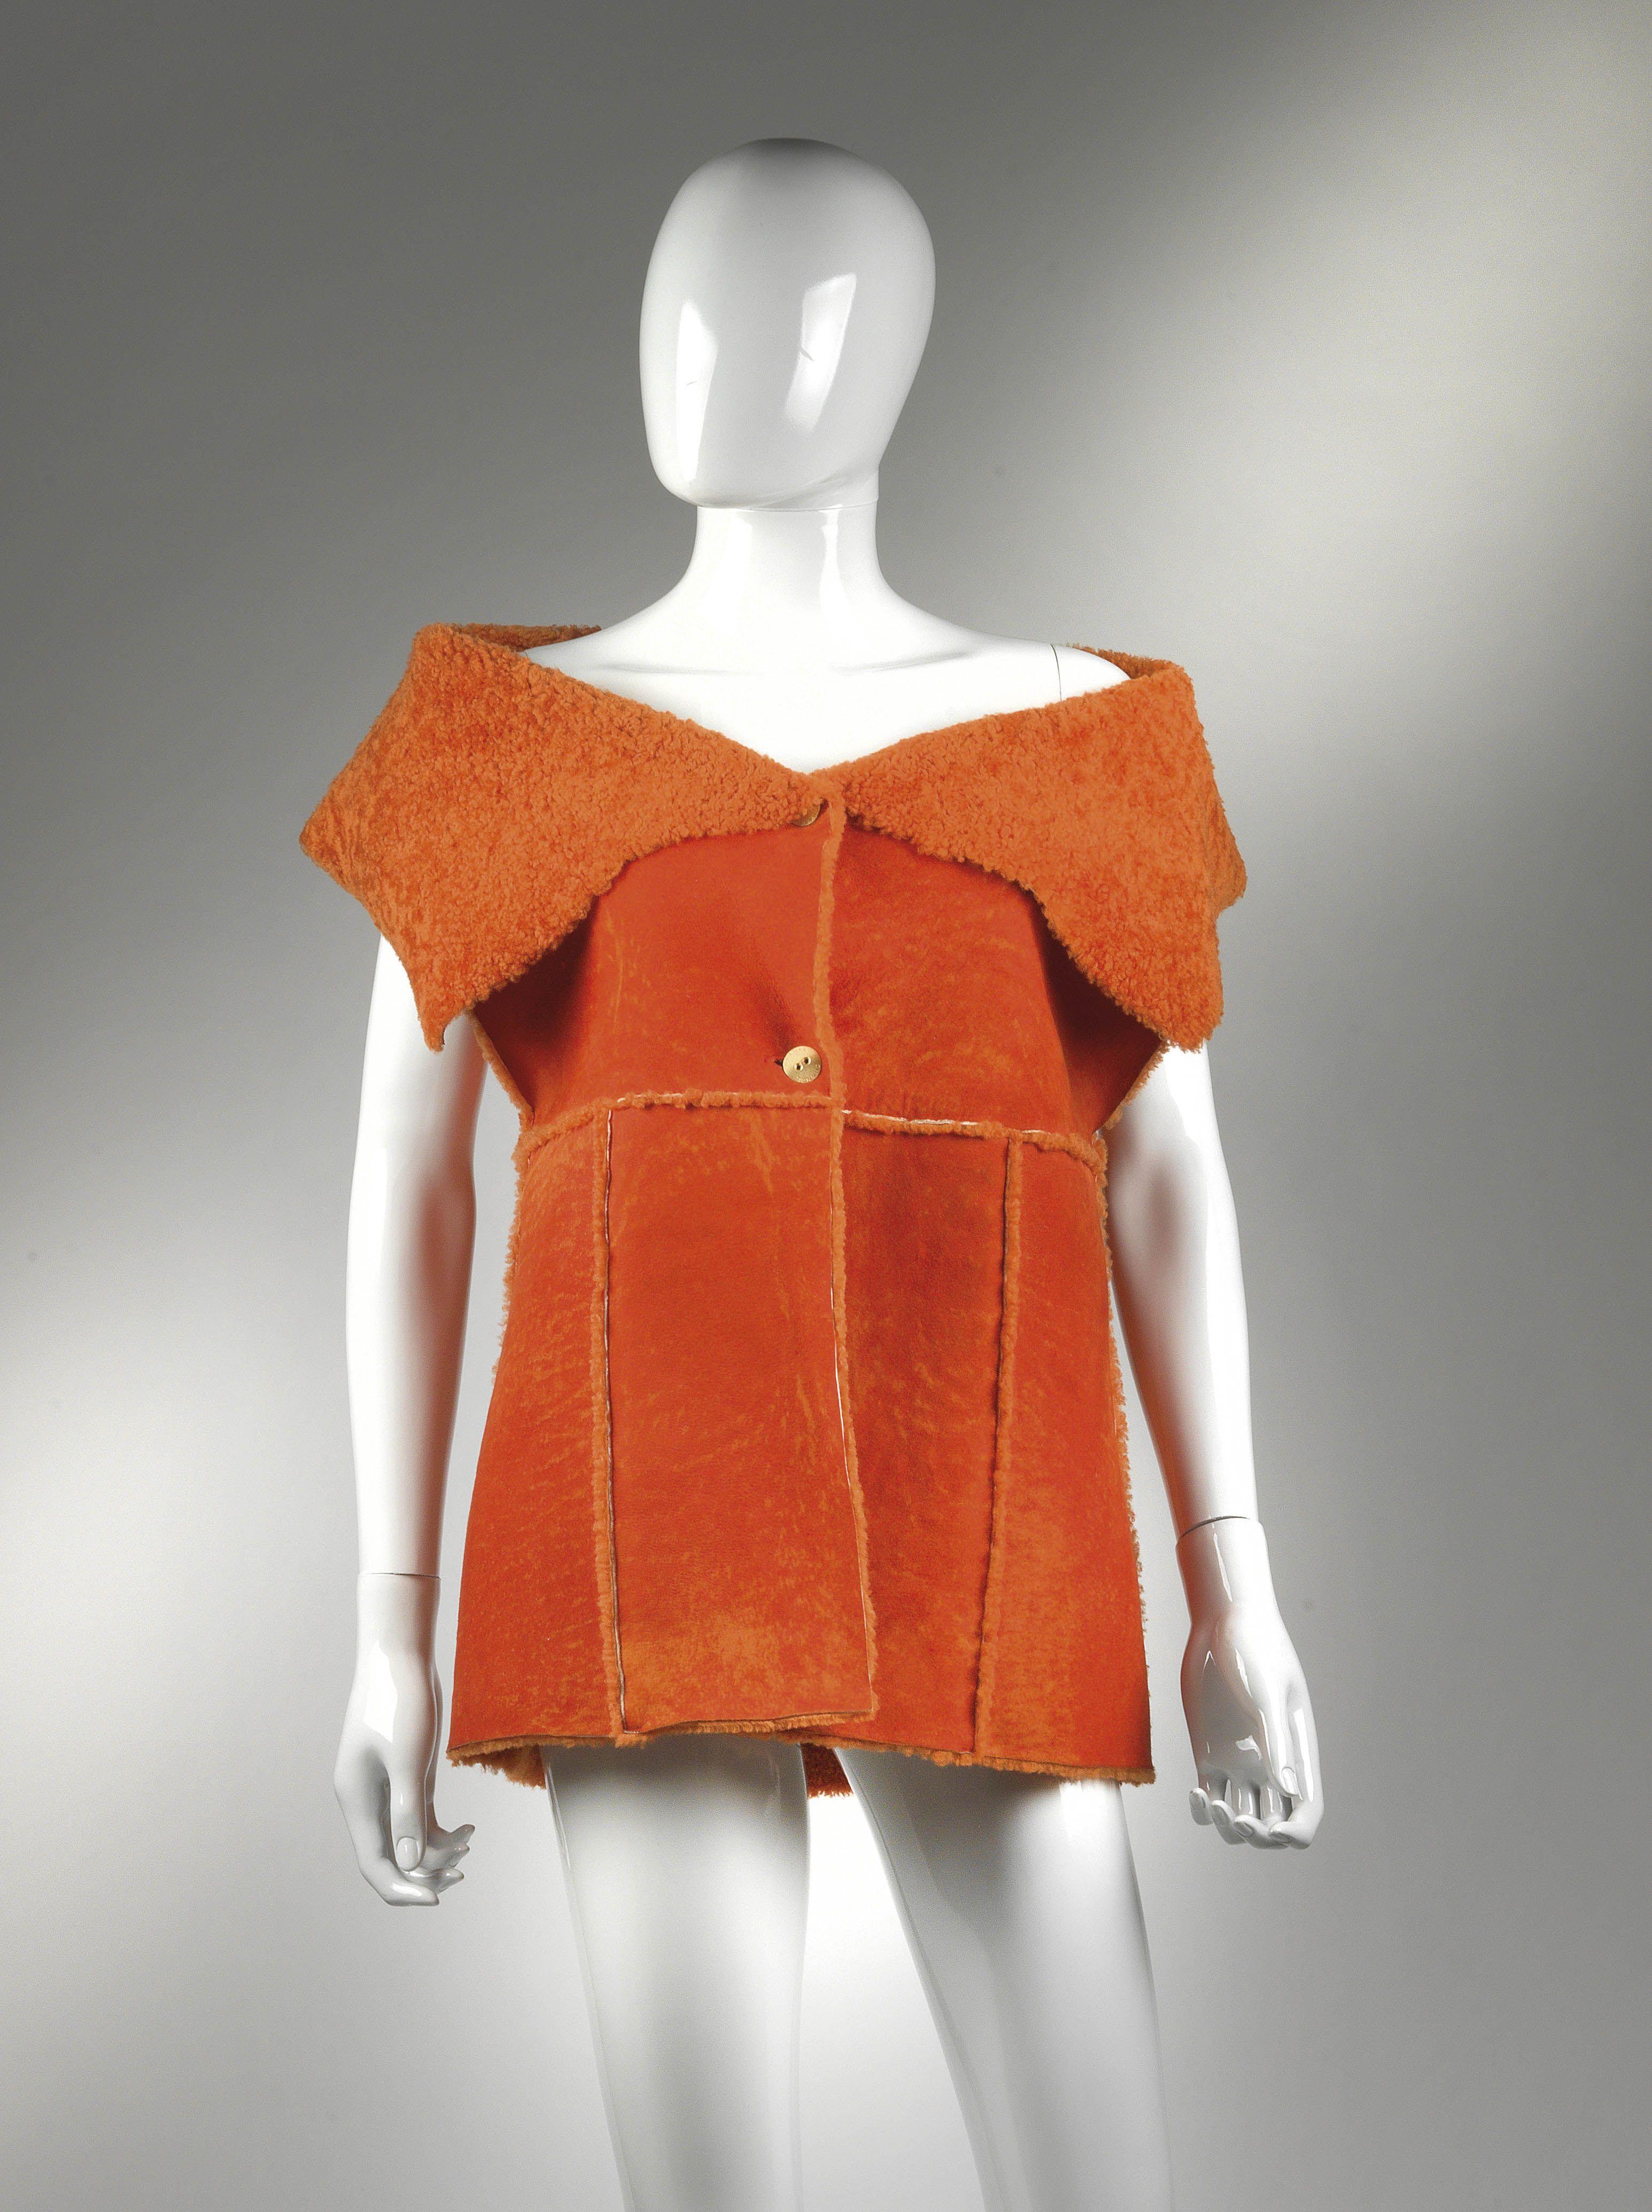 Chanel Auktion Lot 61: Chanel Ledergilet aus der Autumn Collection 2000, Chanel Identification, Größe 40